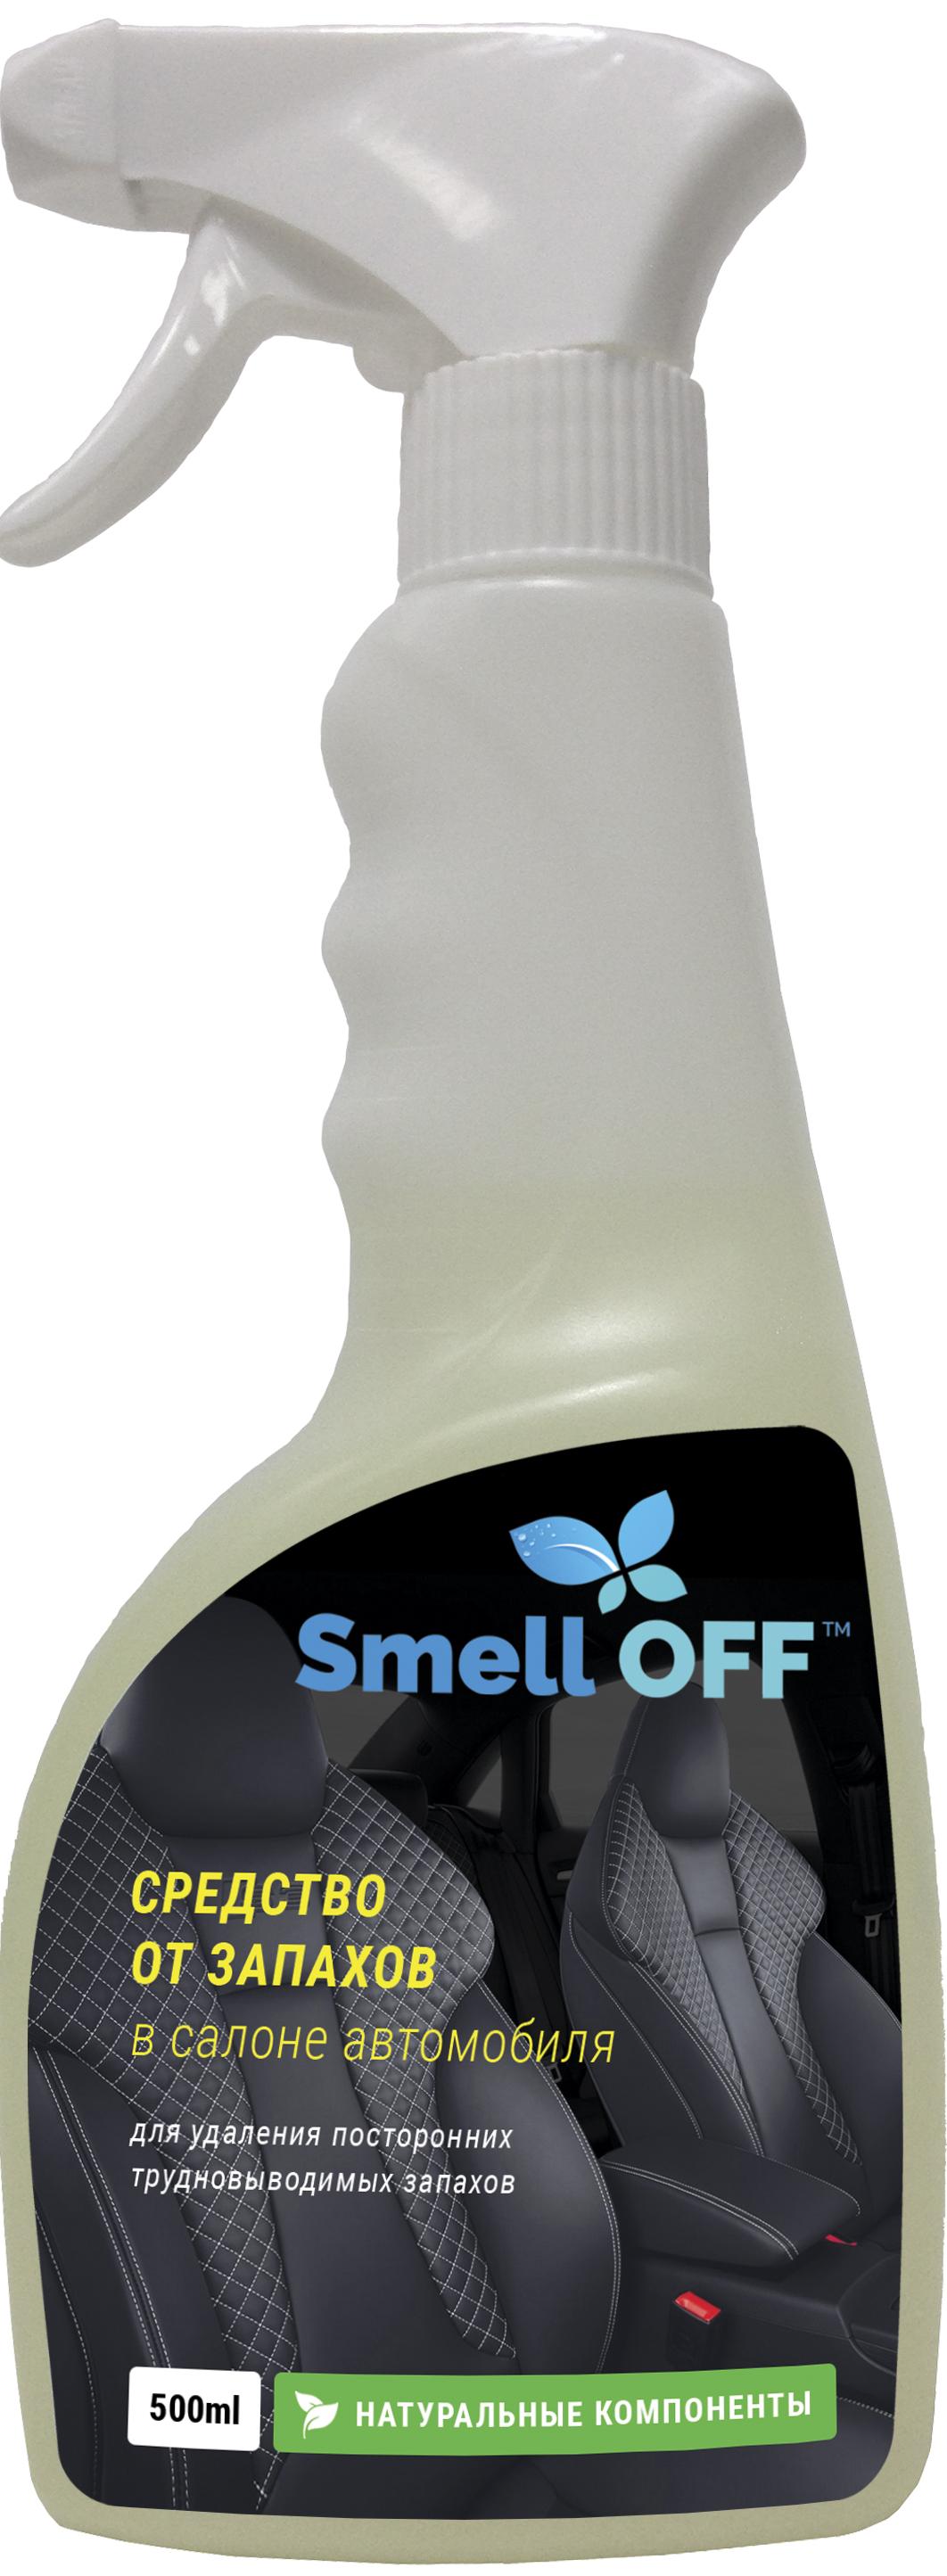 SmellOFF от запахов в салоне автомобиляНейтрализаторы запахов<br><br>